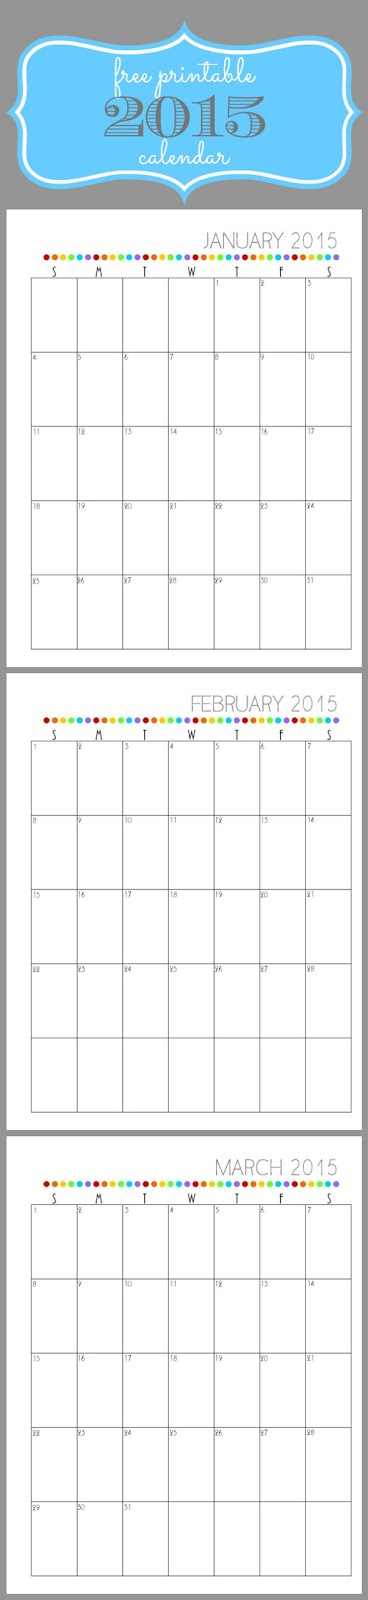 http://www.creationsbykara.com/2014/11/free-printable-2015-calendar.html/